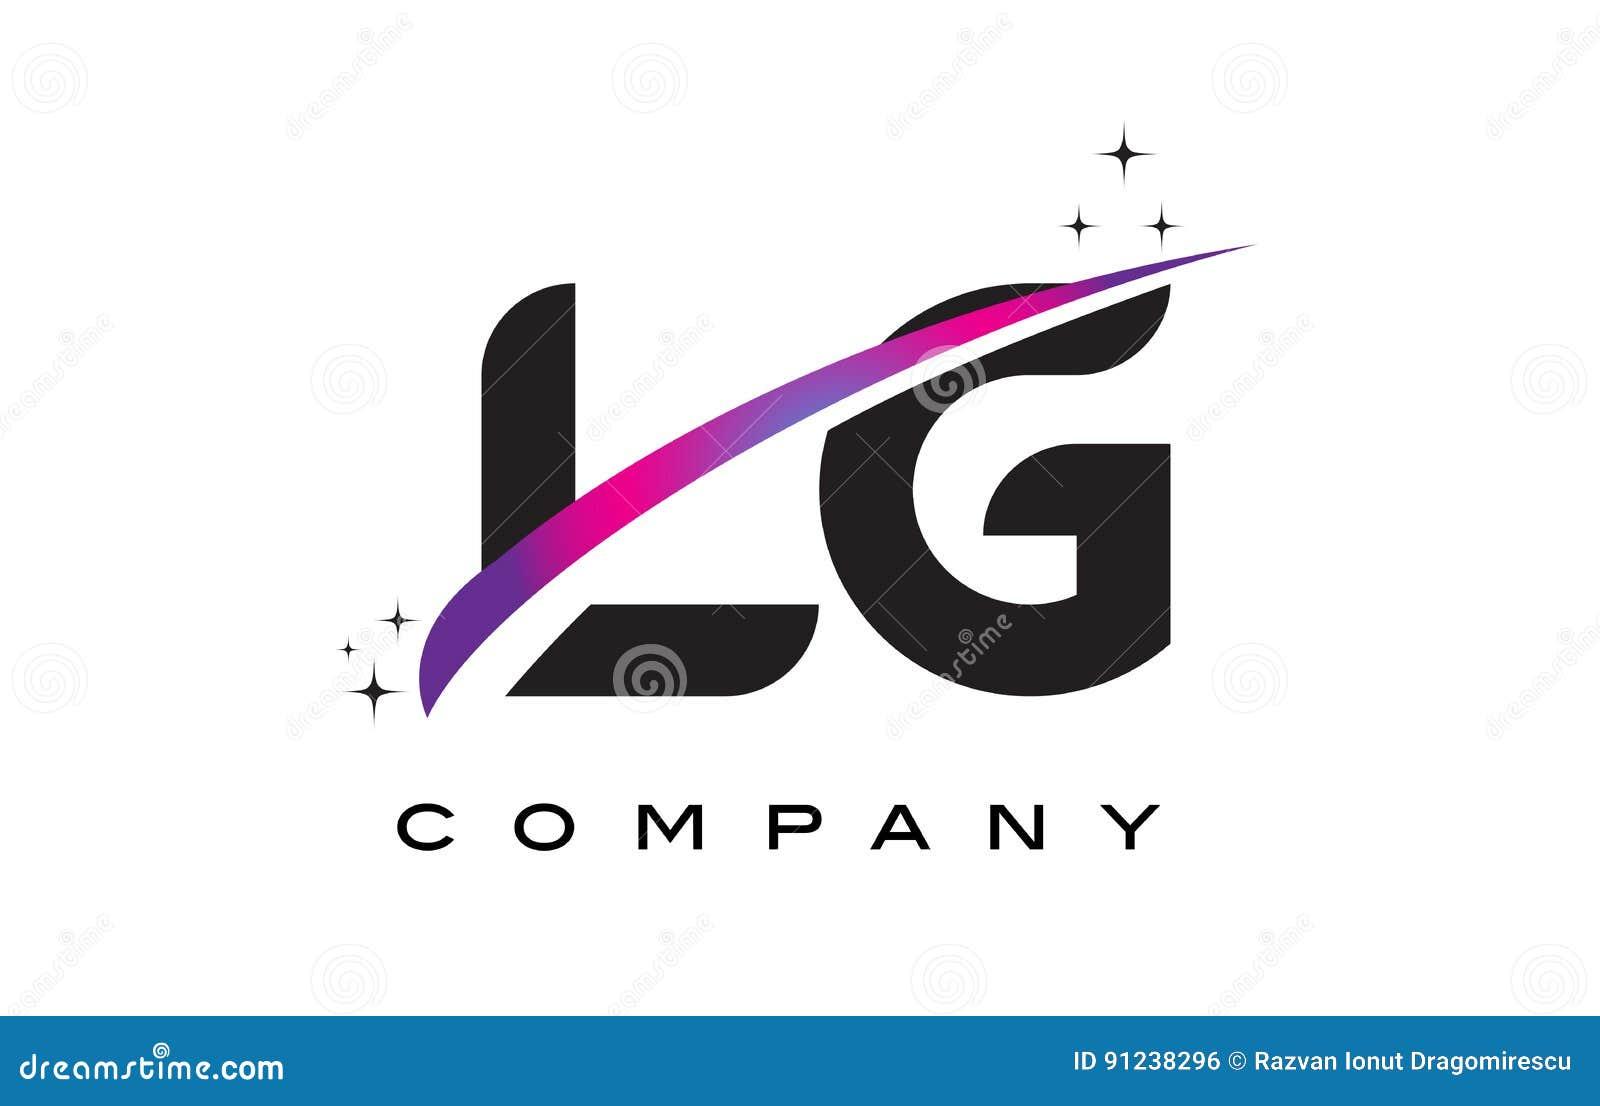 Lg l g black letter logo design with purple magenta swoosh stock download comp altavistaventures Choice Image